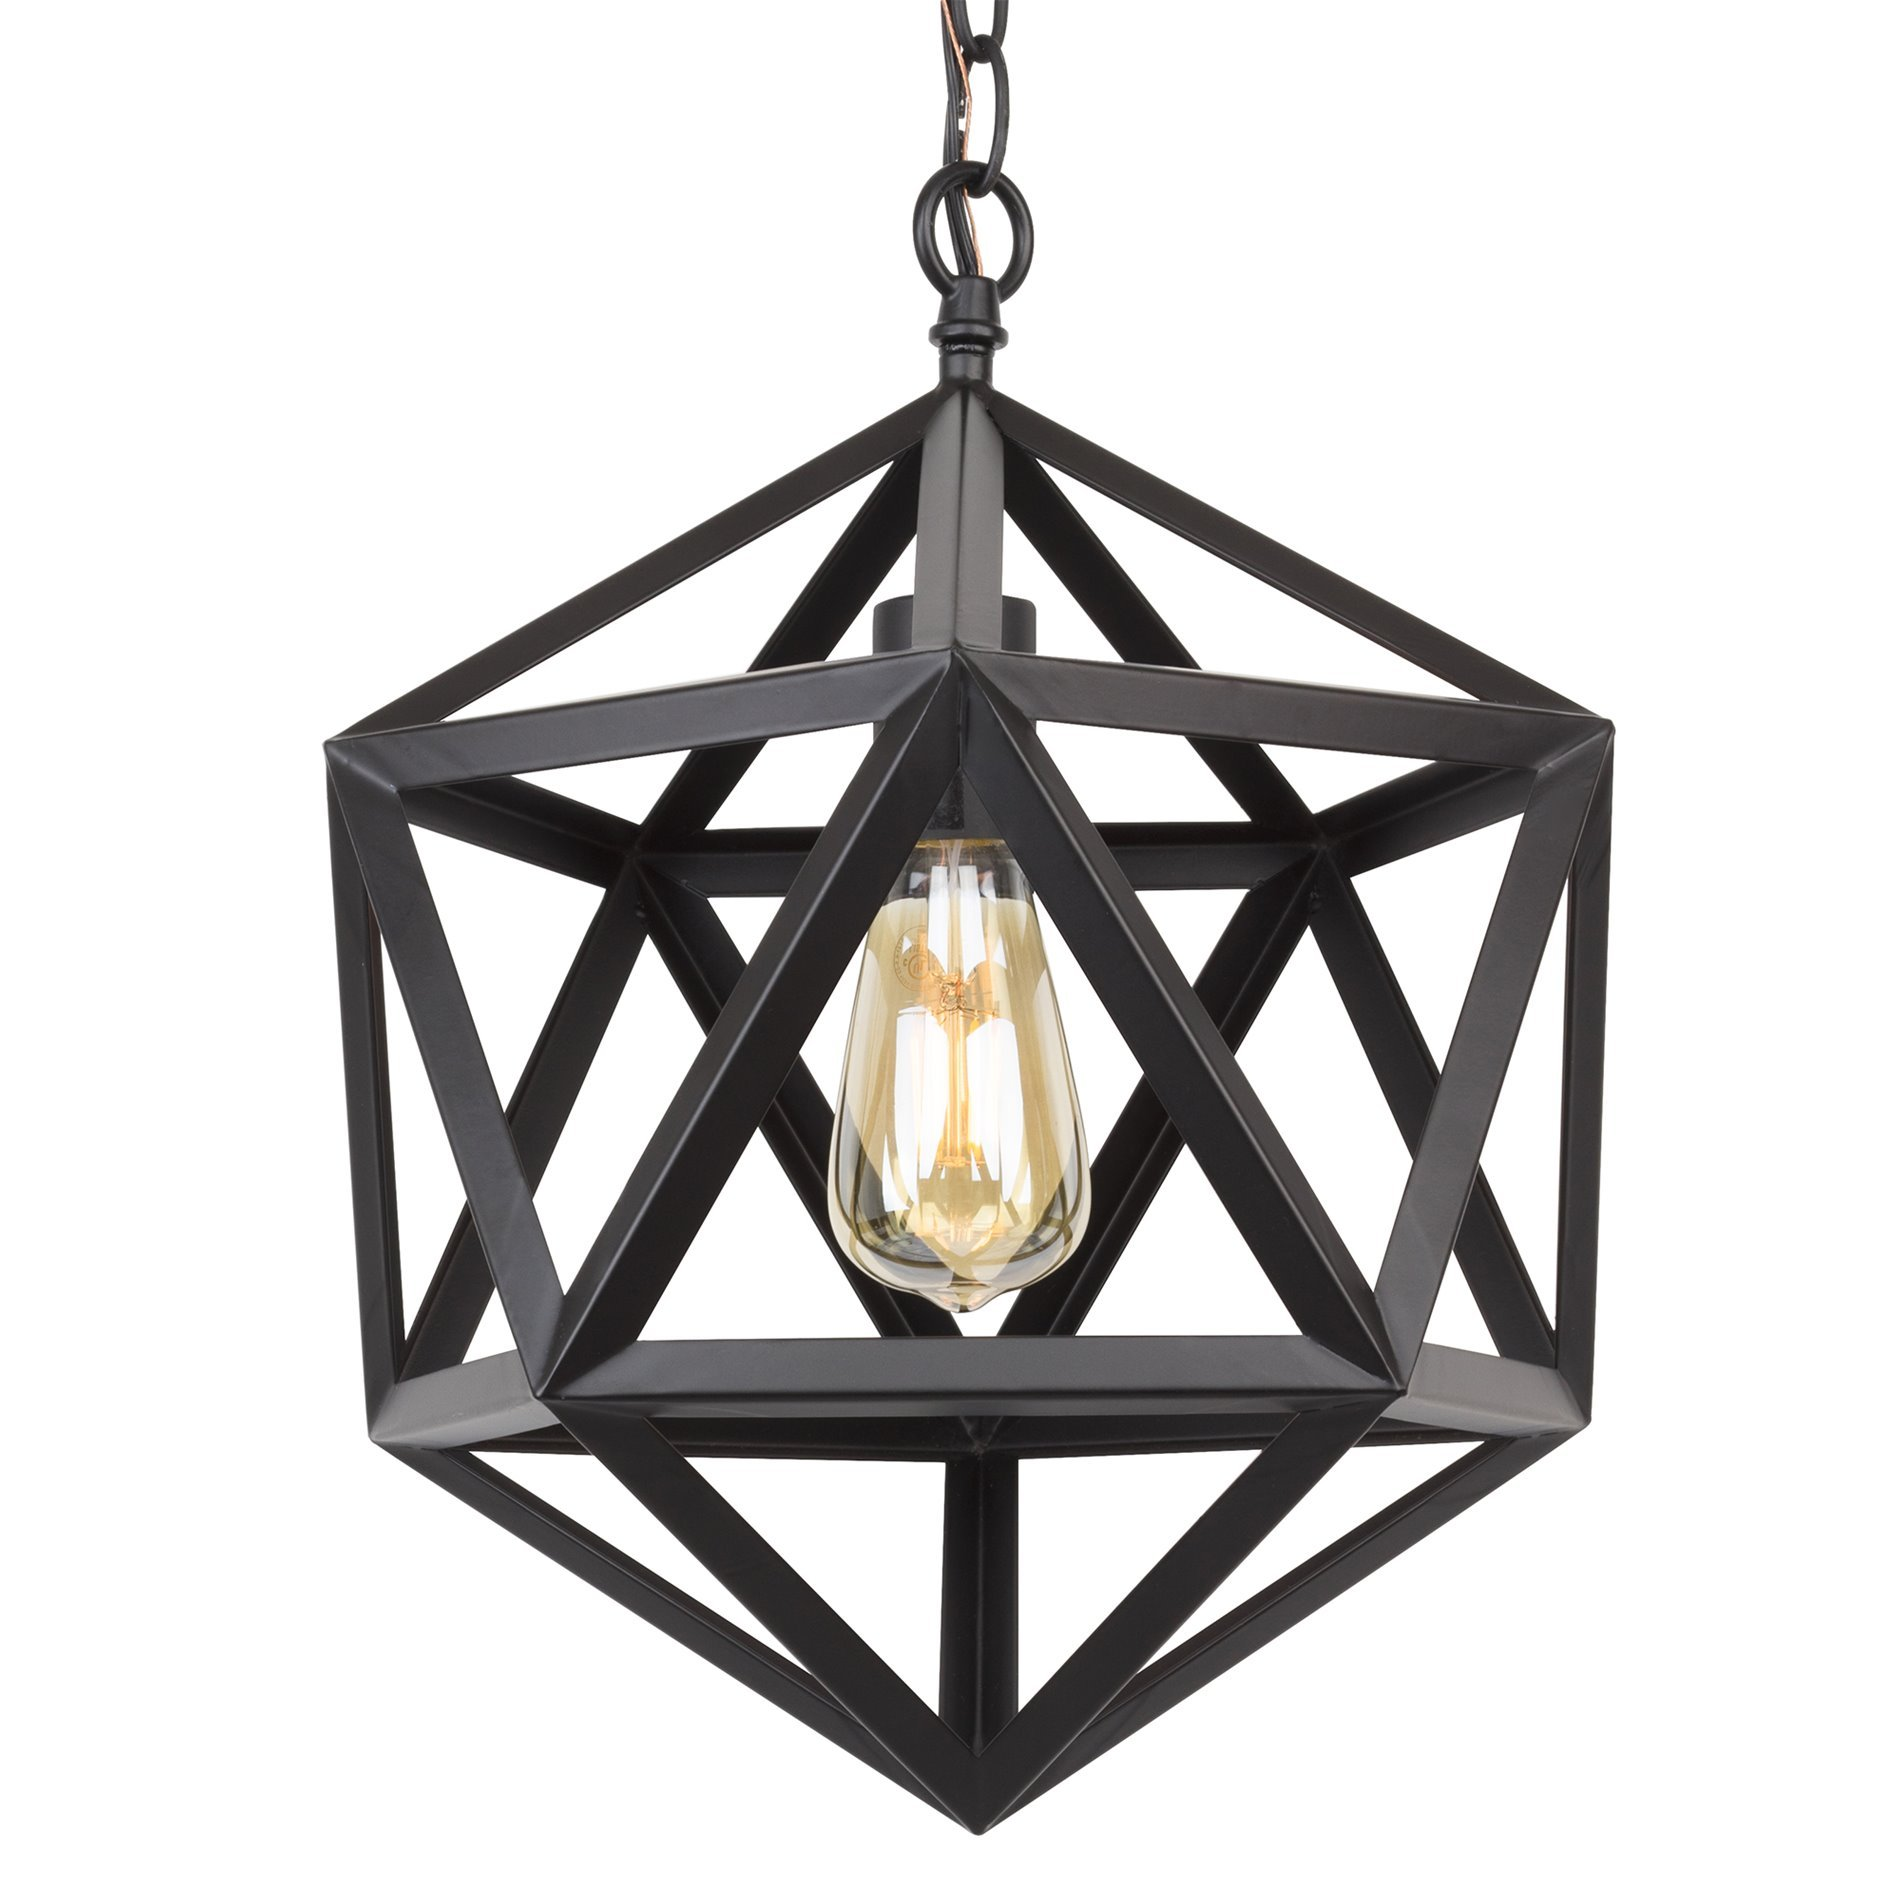 Kira Home Trenton 16'' Industrial Wrought Iron Metal Chandelier, Adjustable Chain, Black Finish